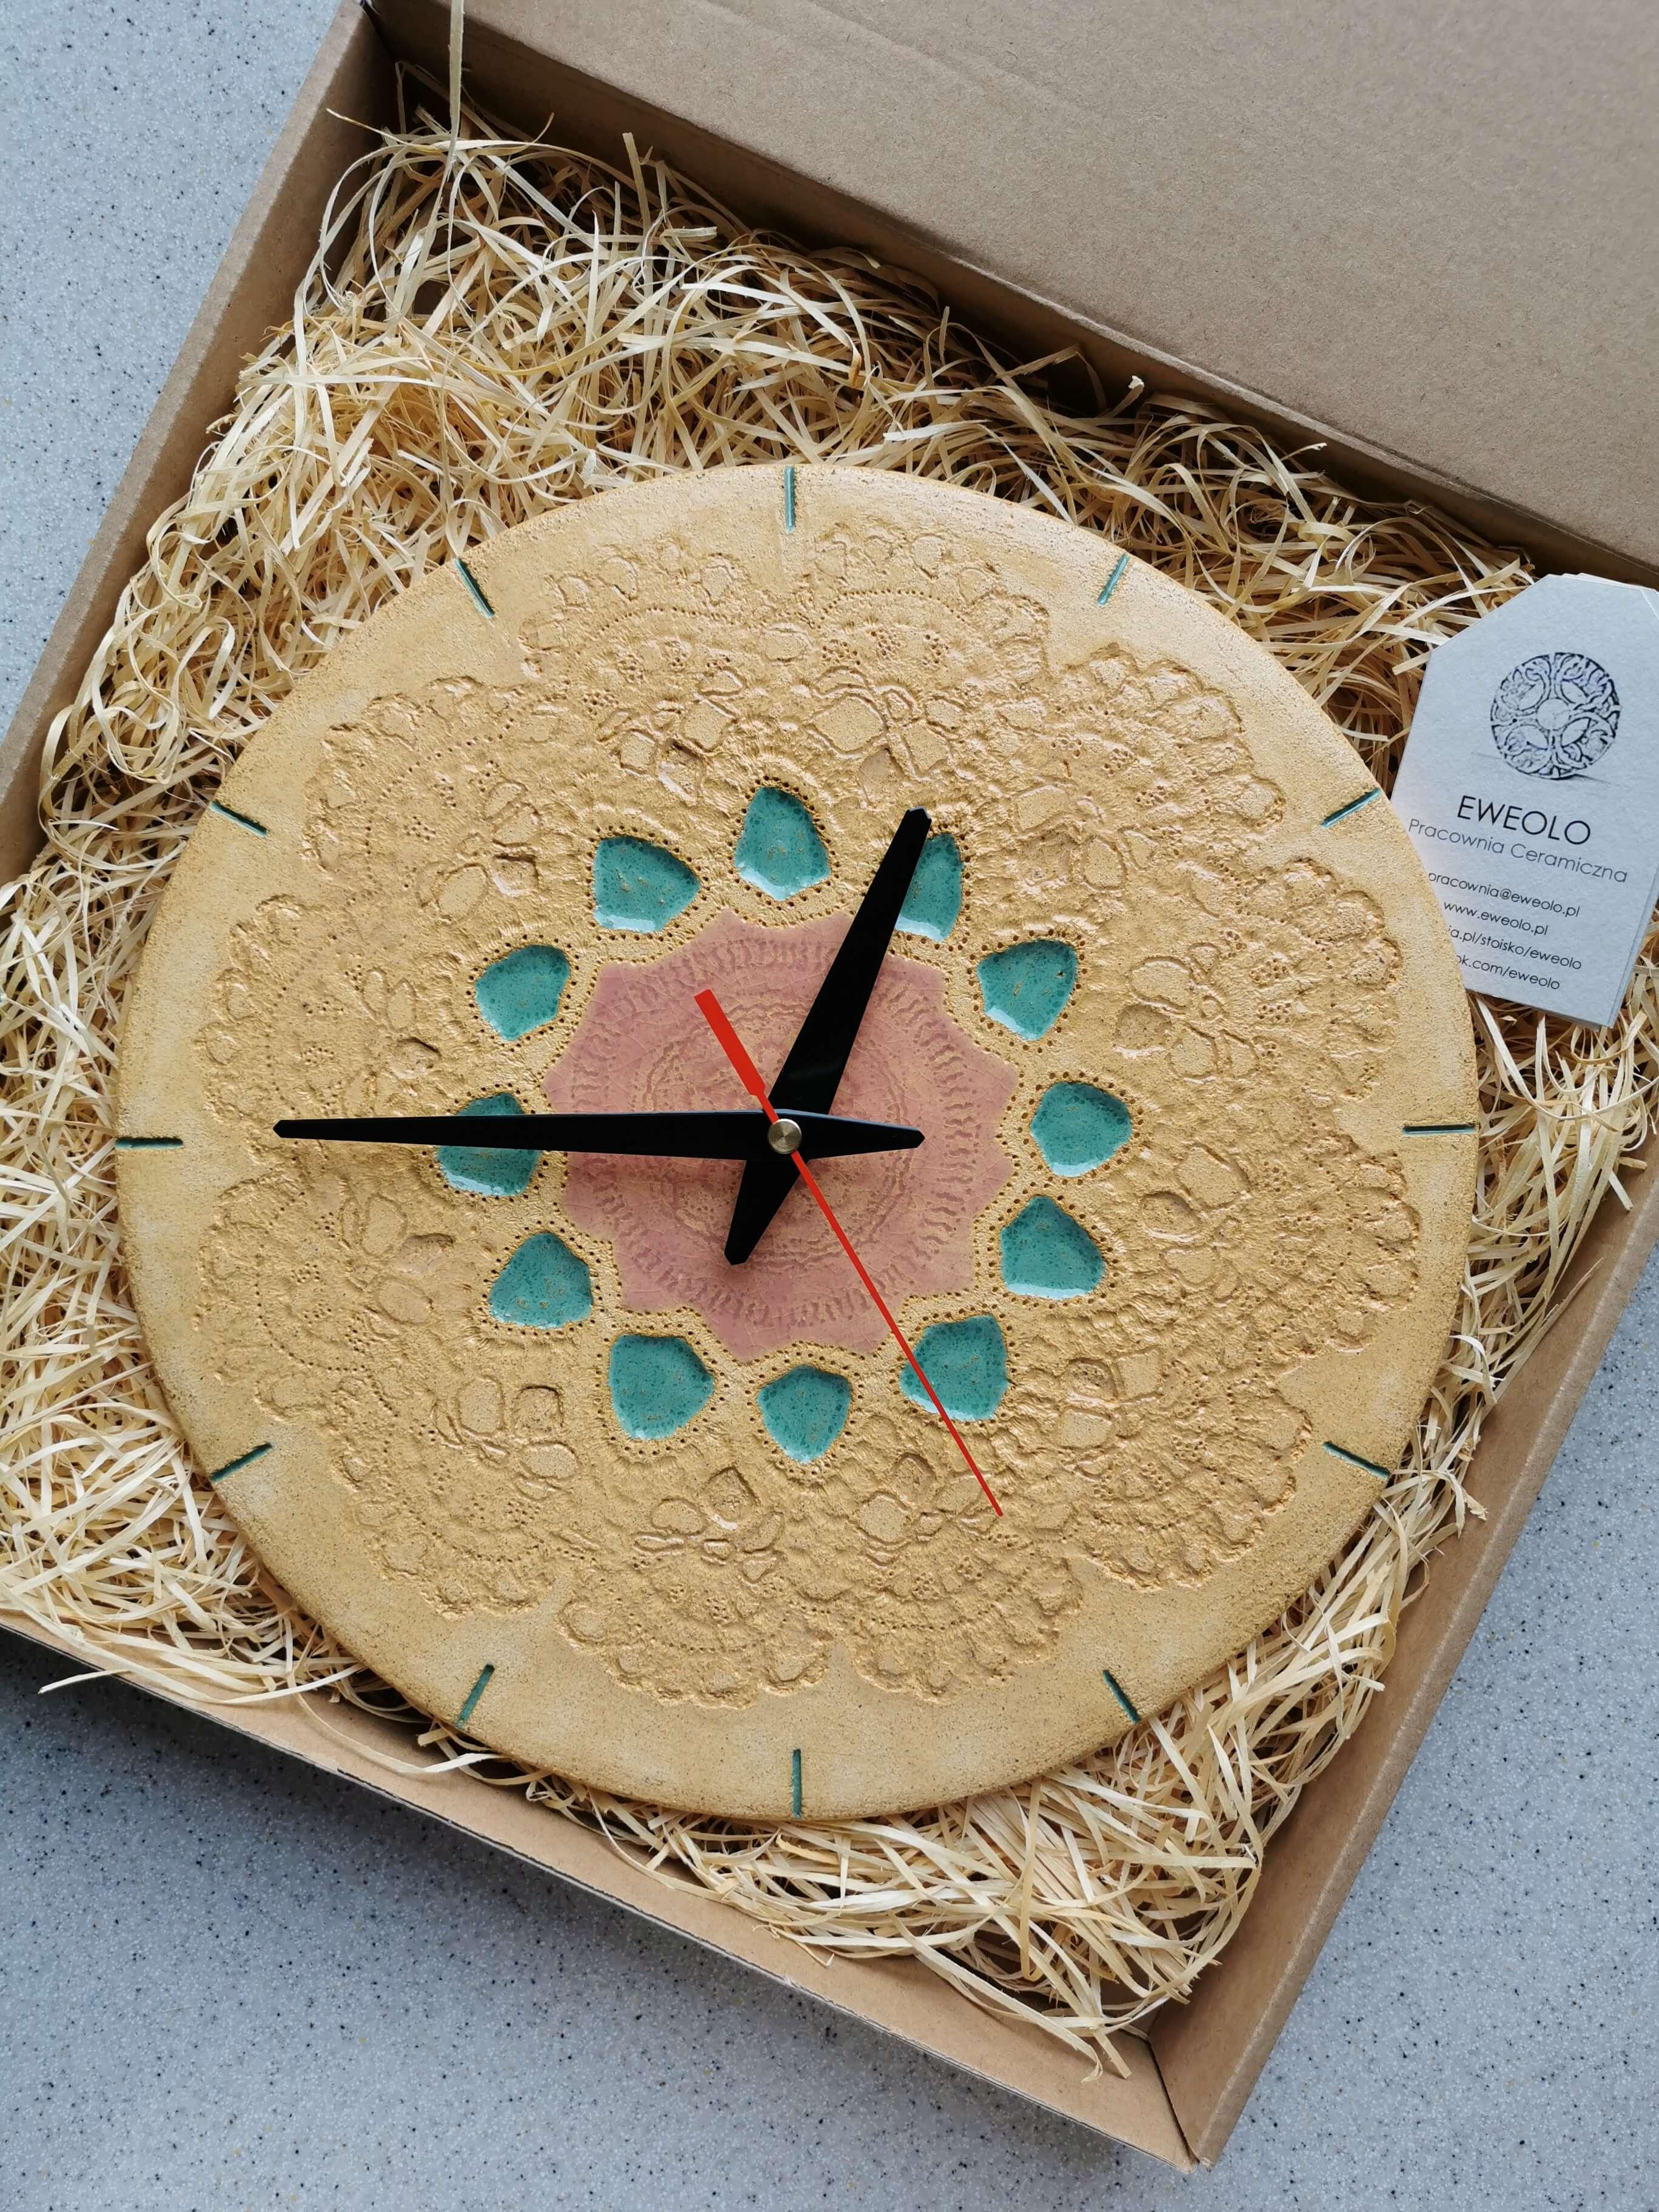 Zegar kremowy ludowy